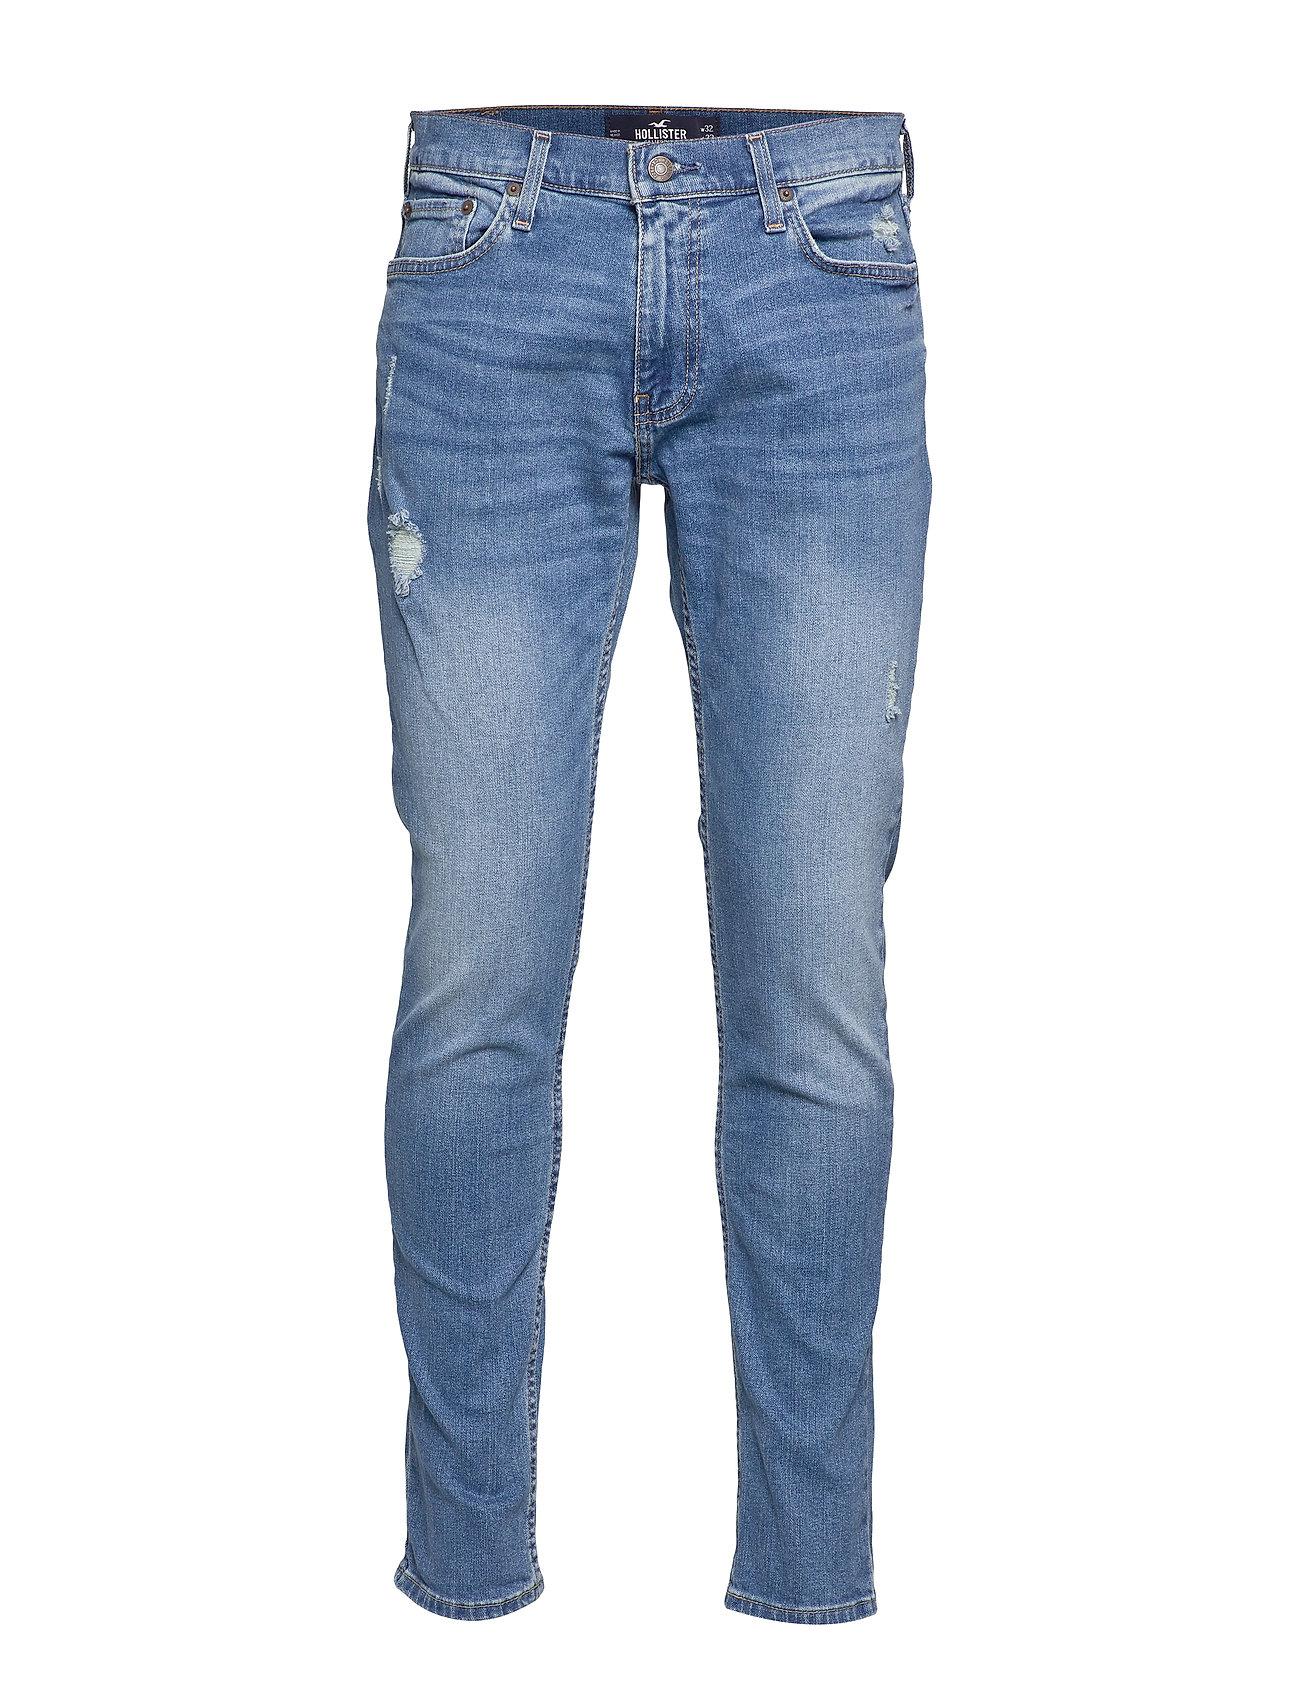 Jeanslight Skinny Epic Hollister Flex Destroy N80nwvm